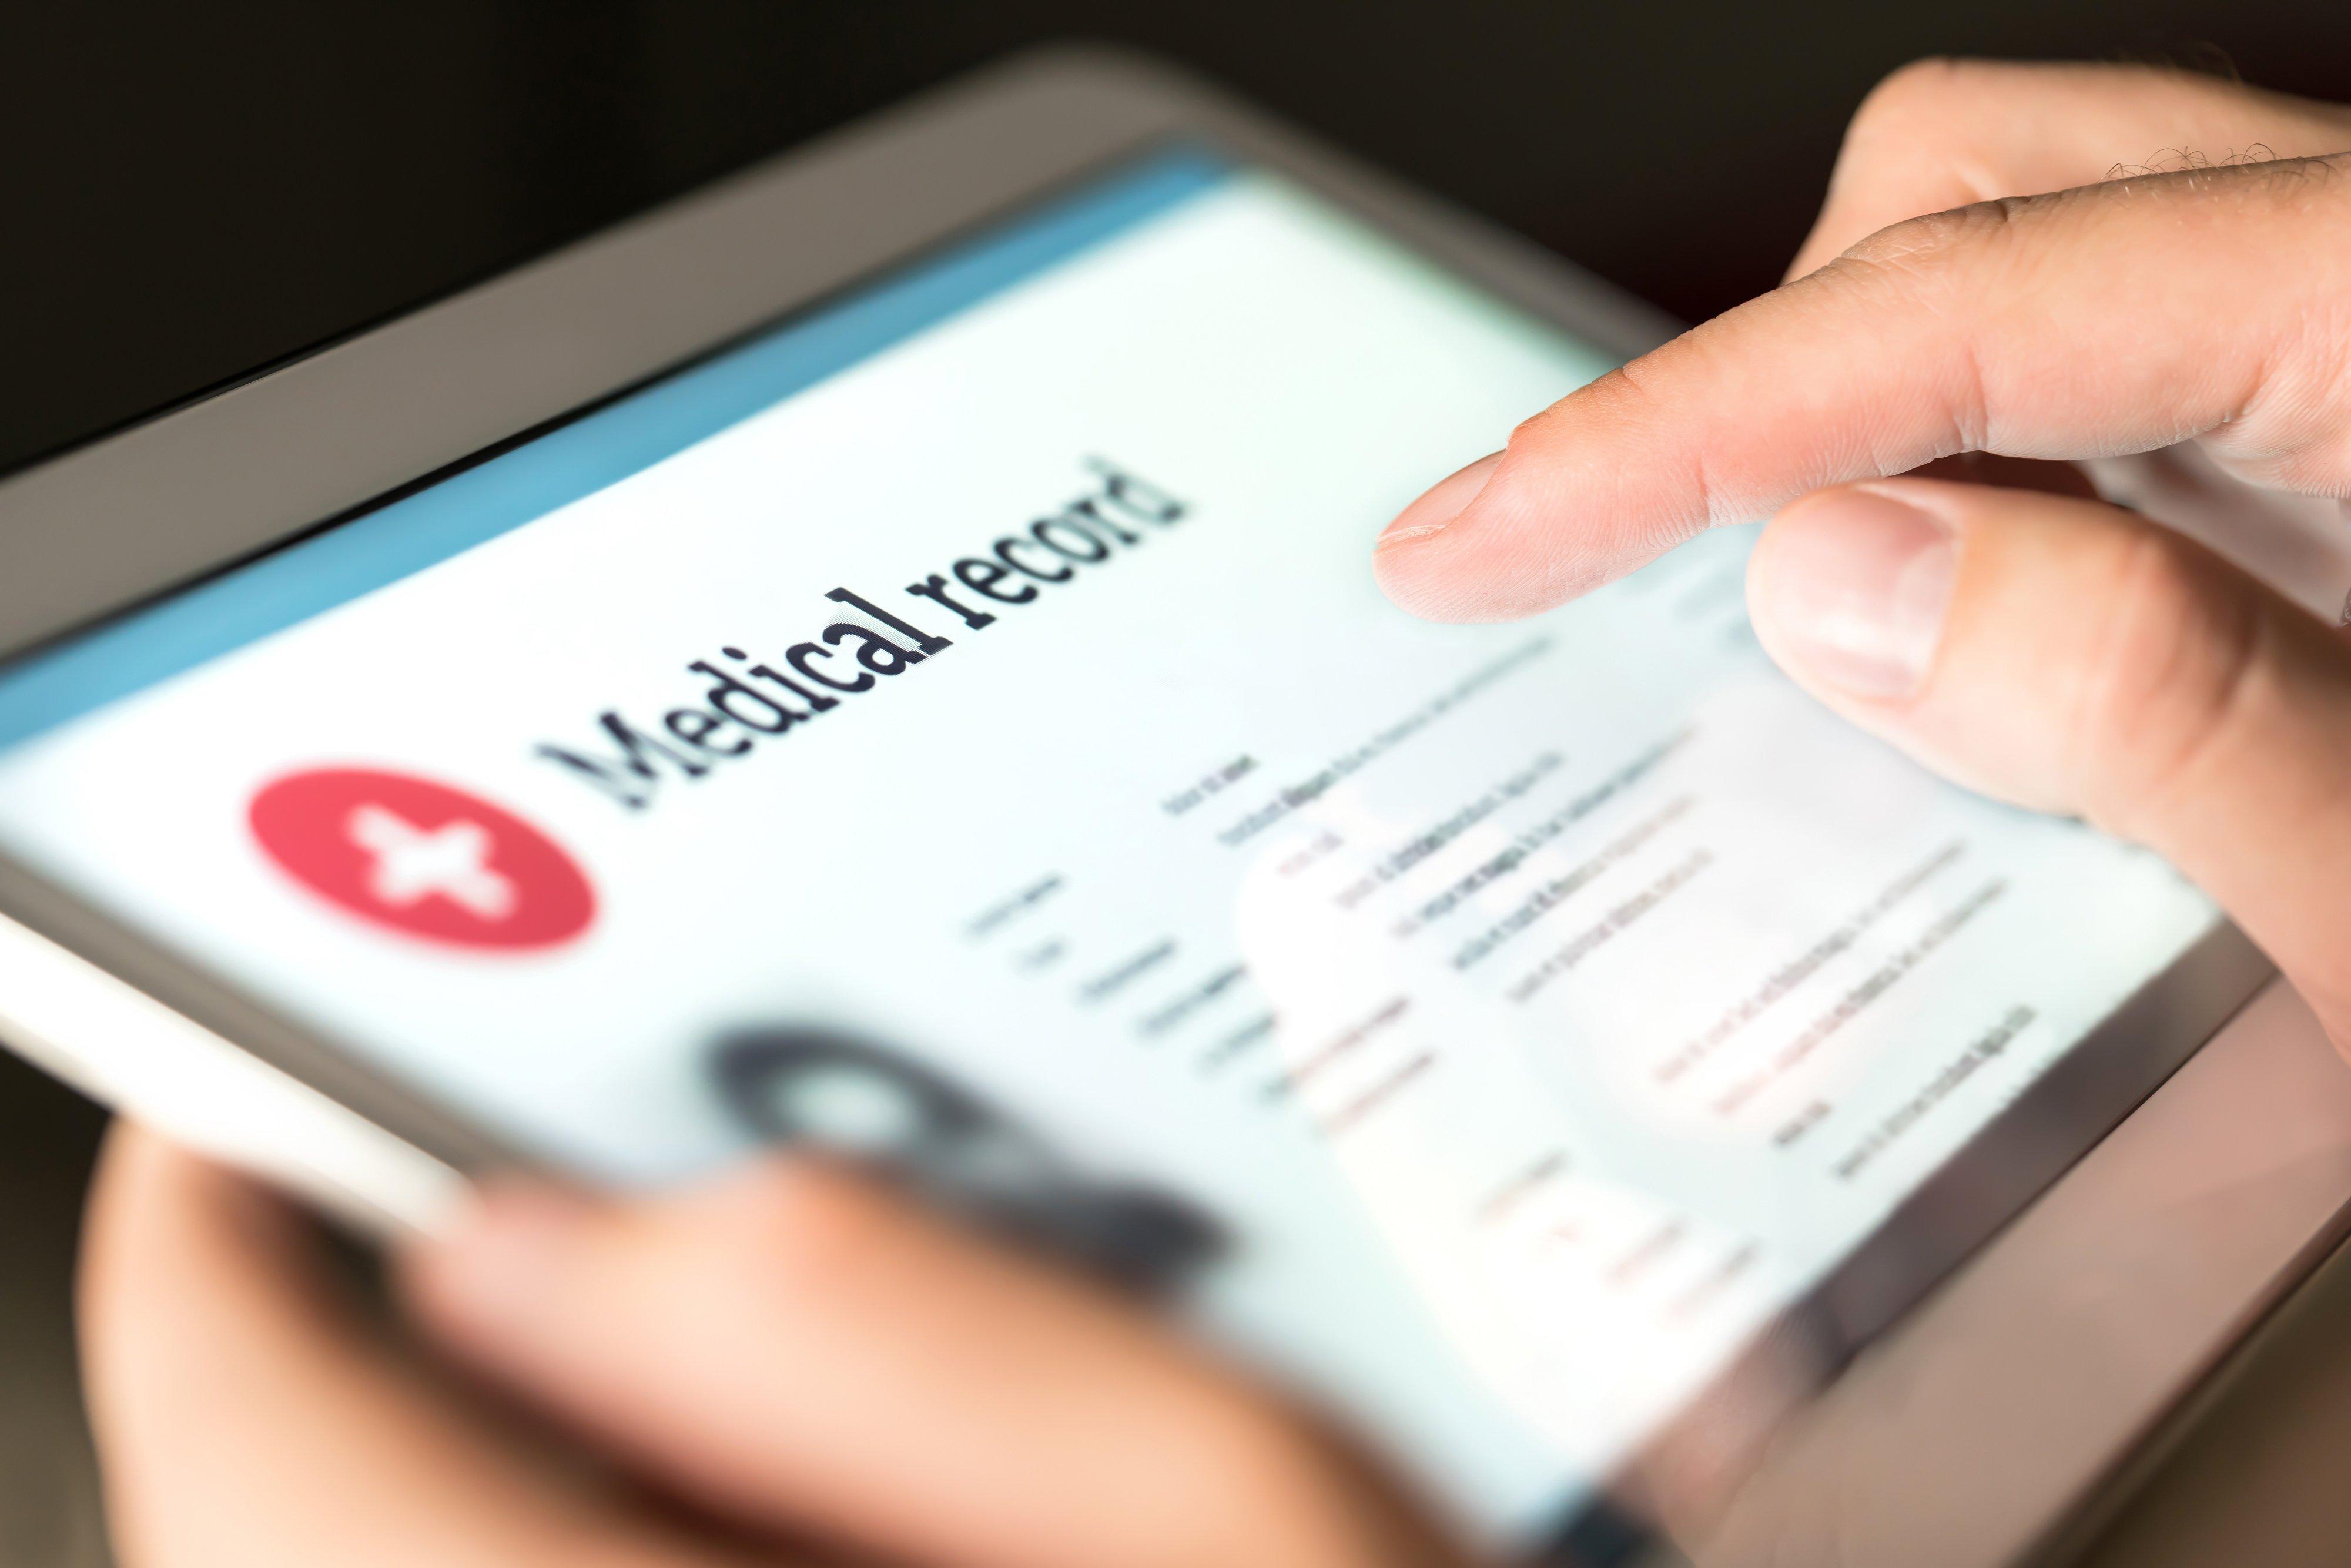 patient digital ehr access